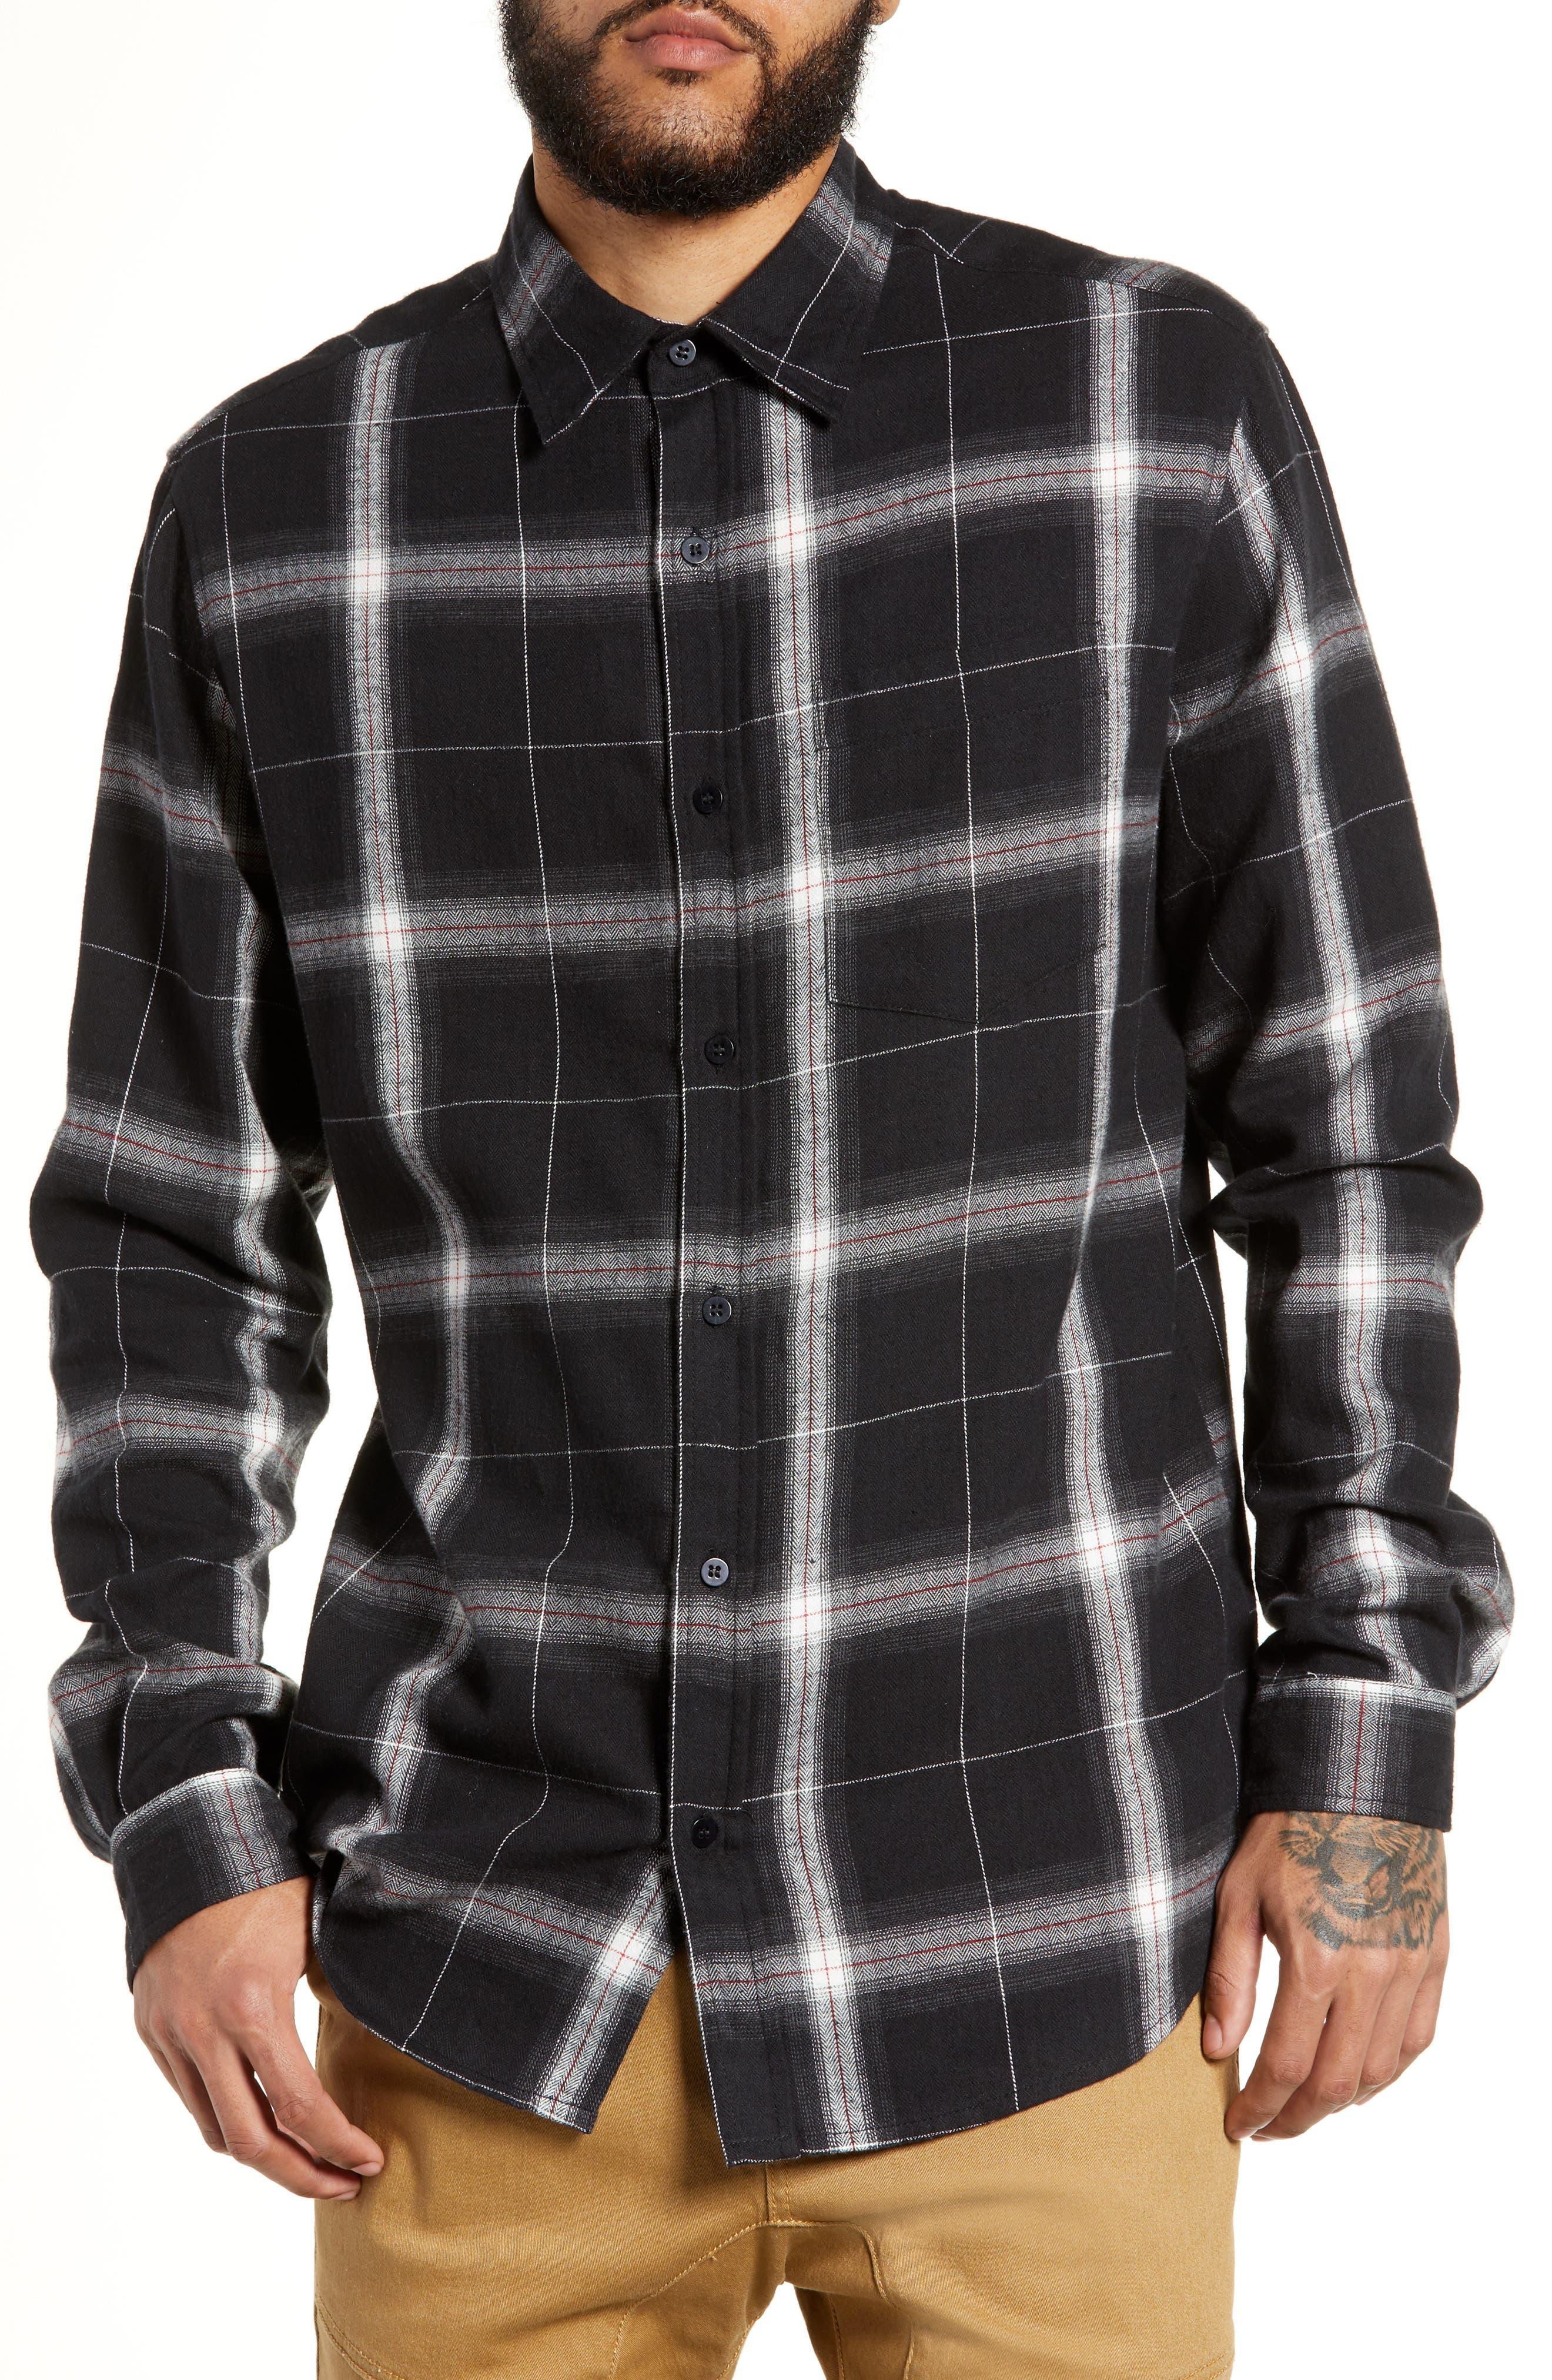 Lira Clothing Juju Long Sleeve Plaid Woven Shirt